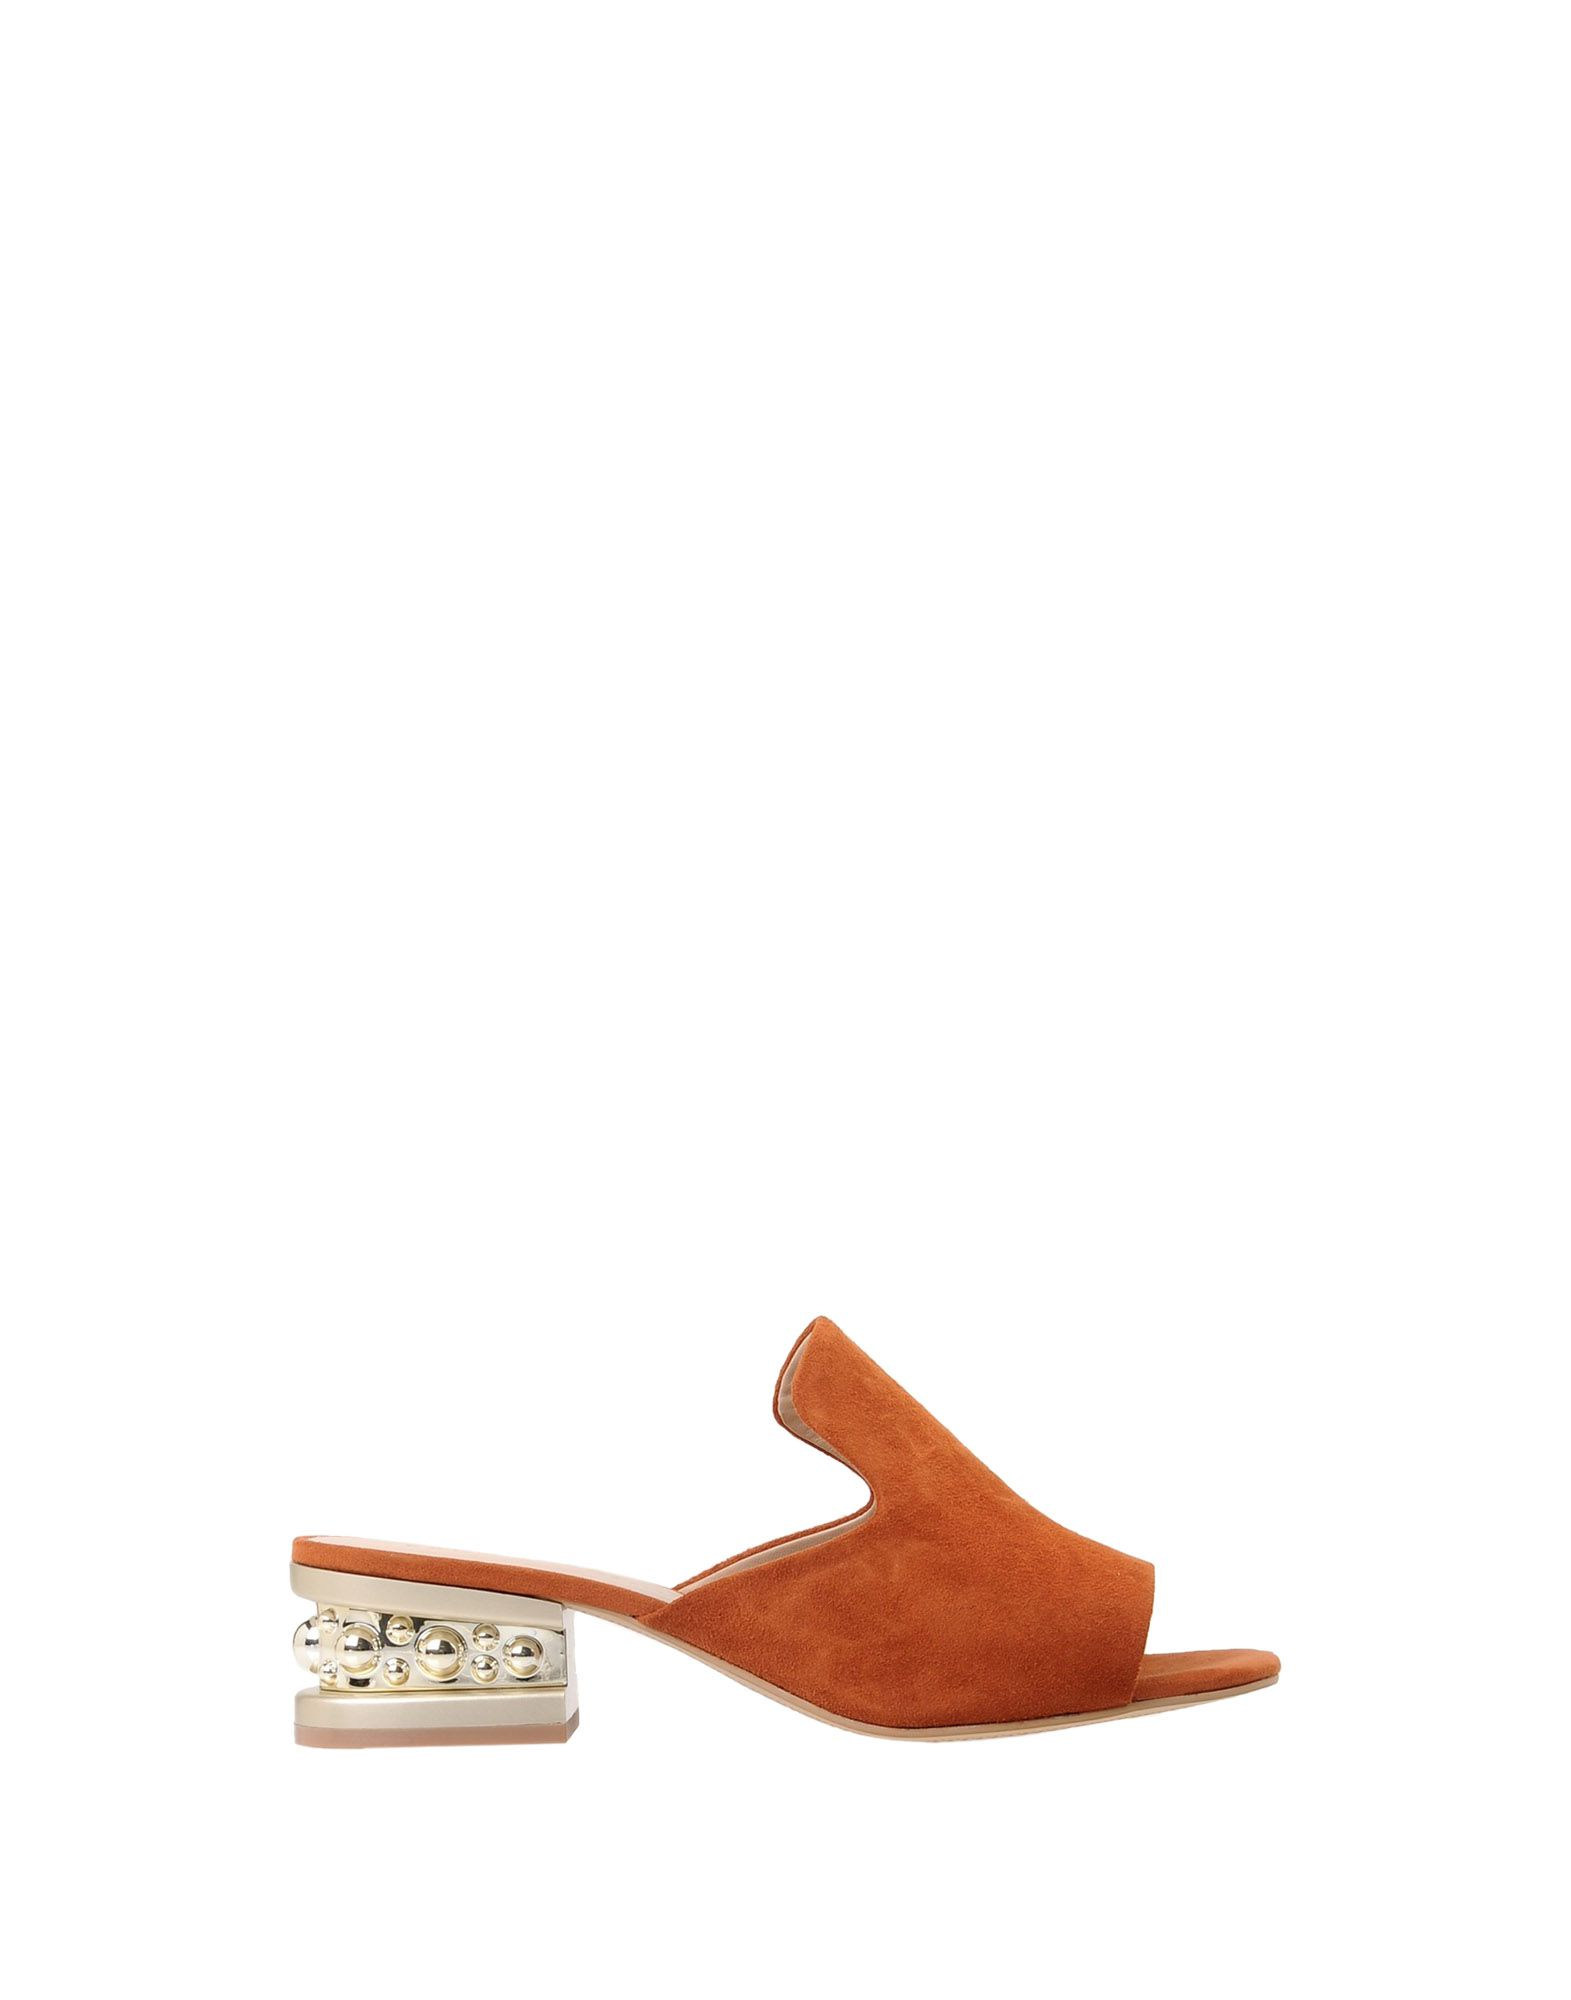 Bruno Premi Premi Sandals - Women Bruno Premi Premi Sandals online on  United Kingdom - 11463341HL 56cd95